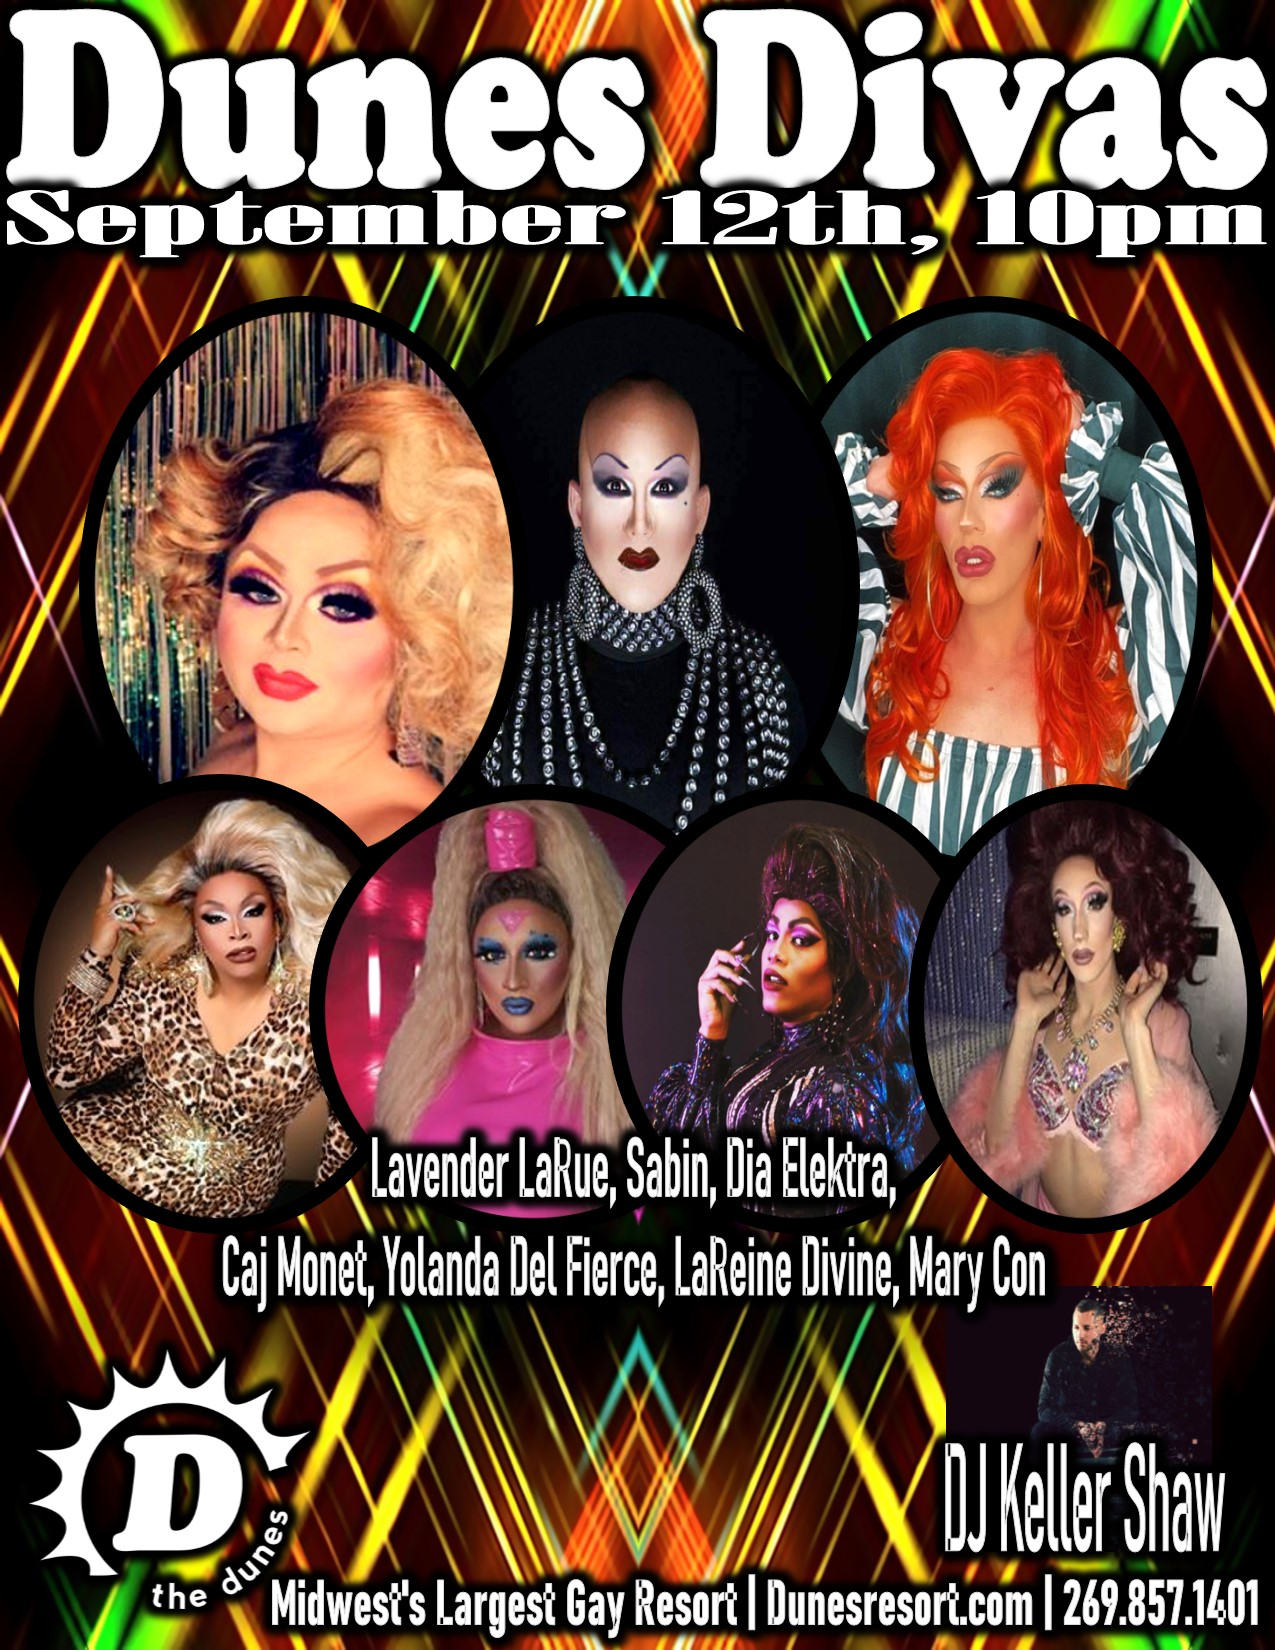 Dunes Divas poster for September 12, 2020 event.